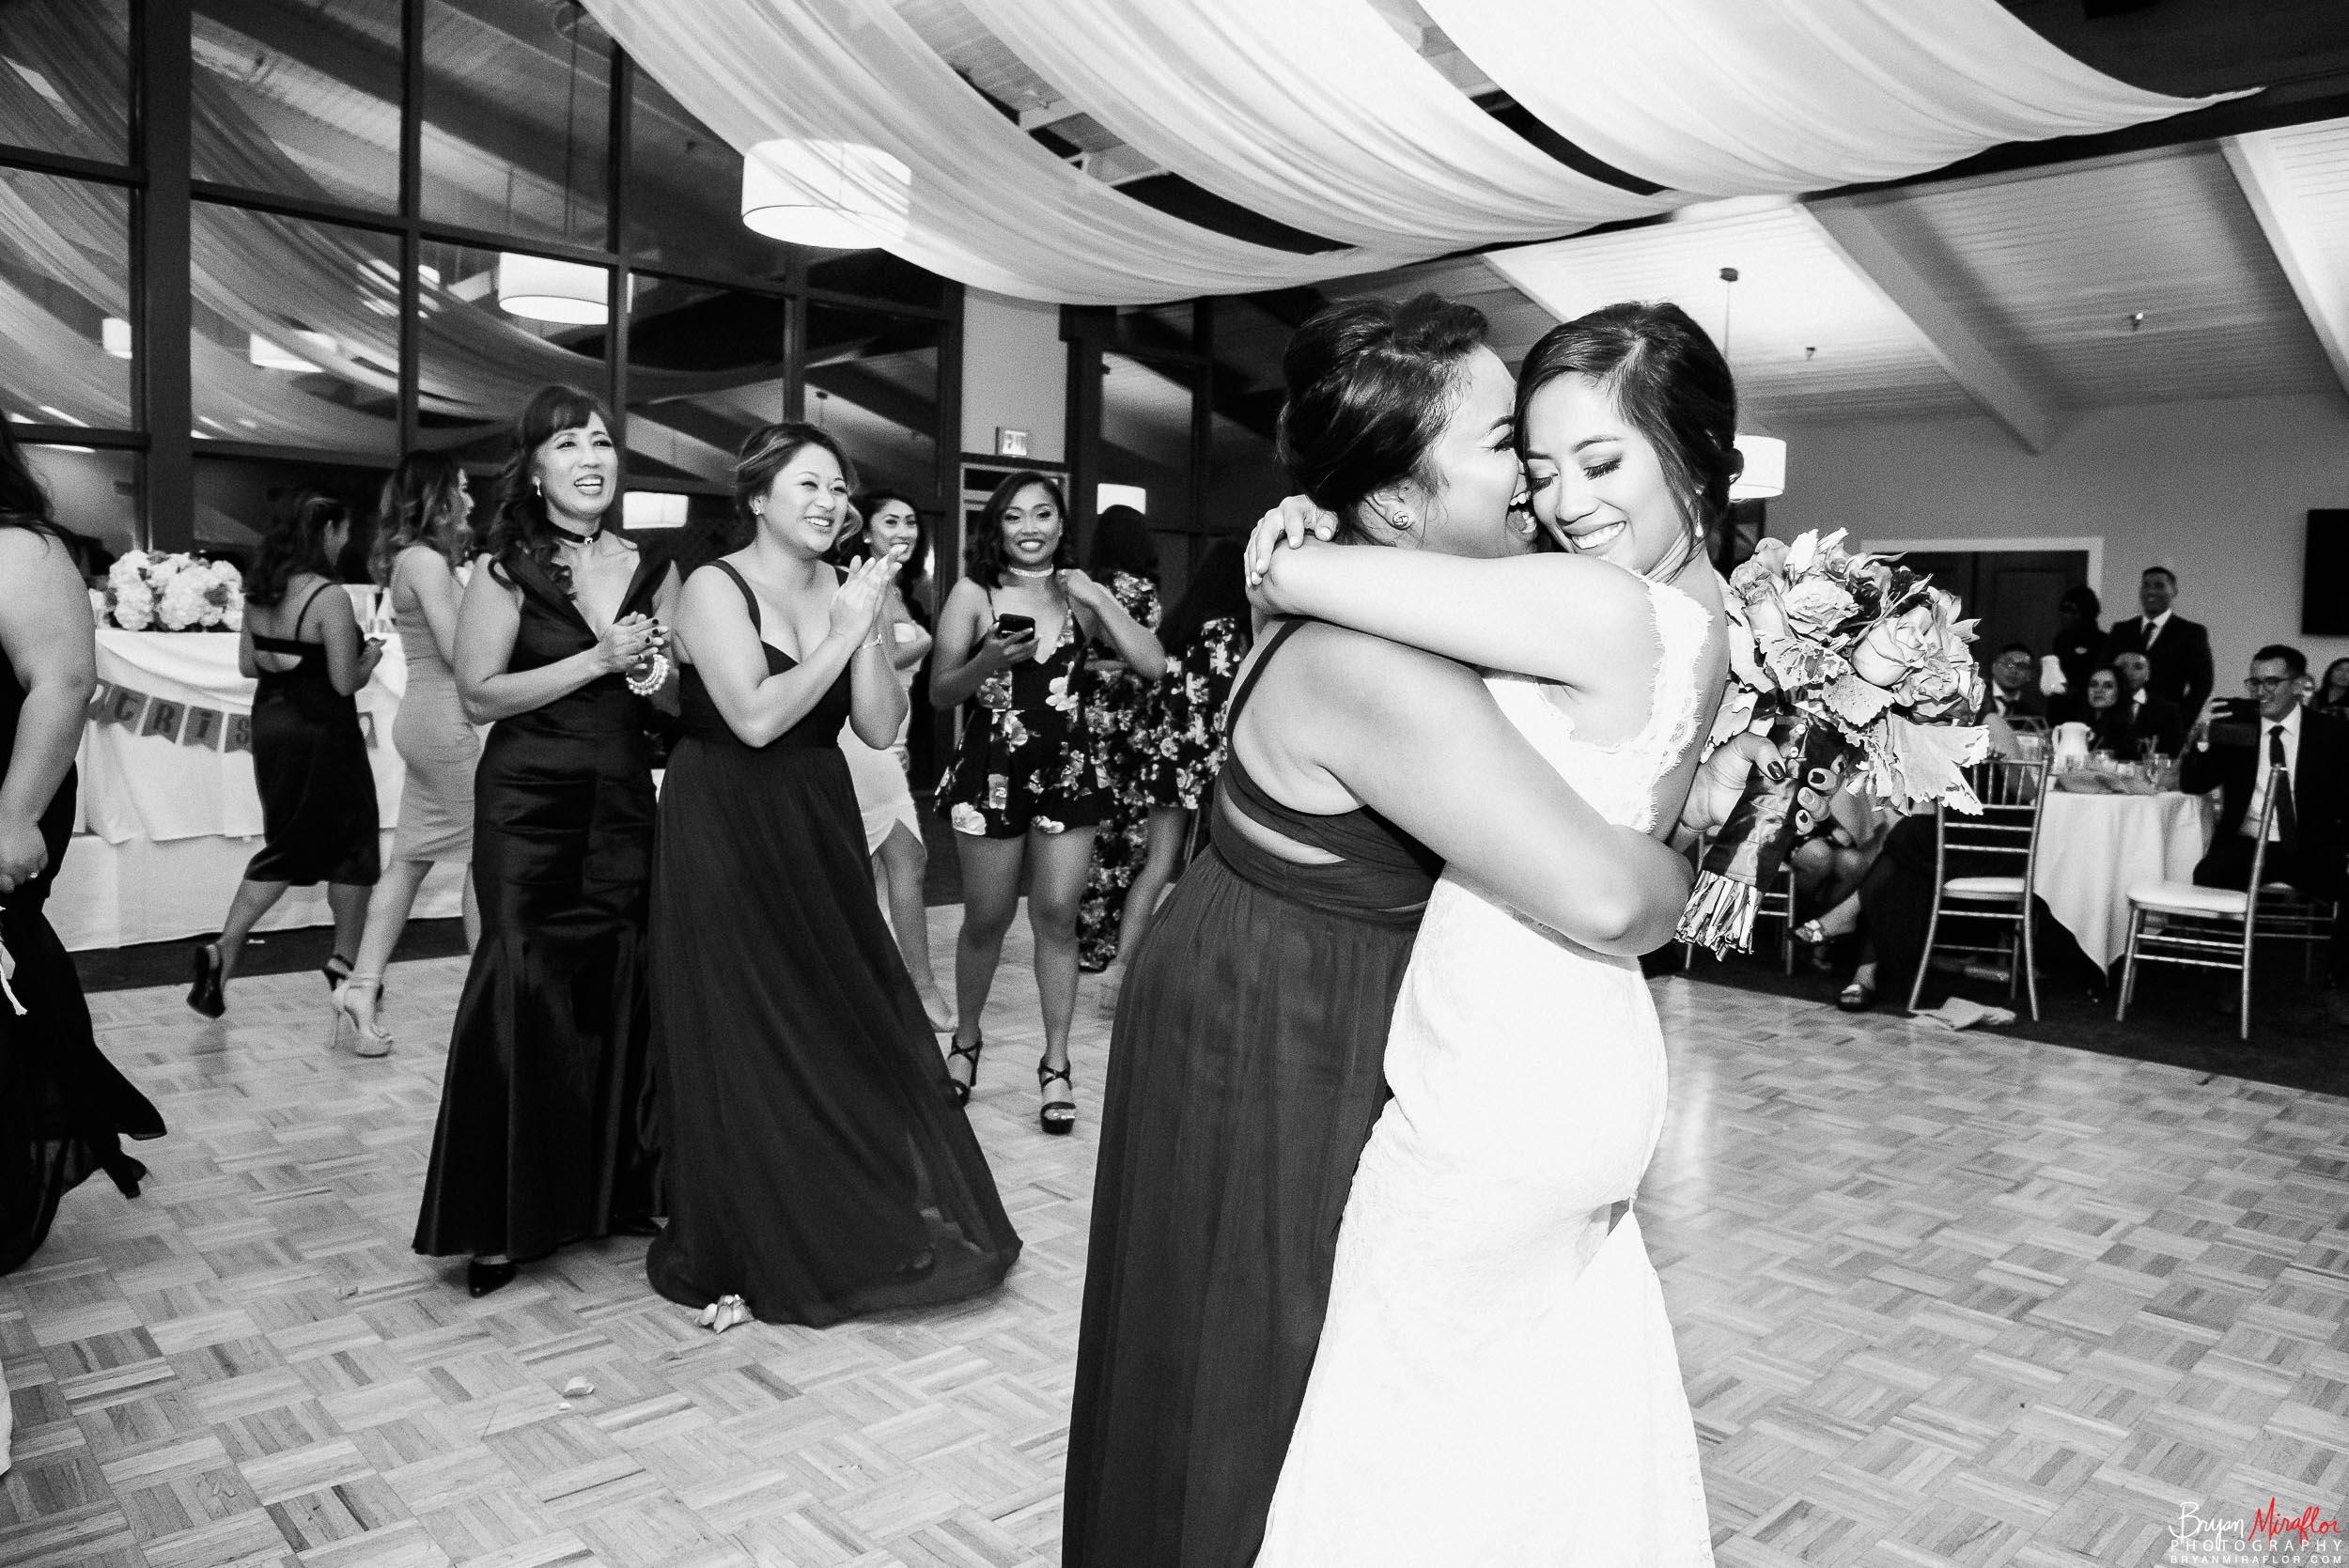 Bryan-Miraflor-Photography-Trisha-Dexter-Married-20170923-073.jpg